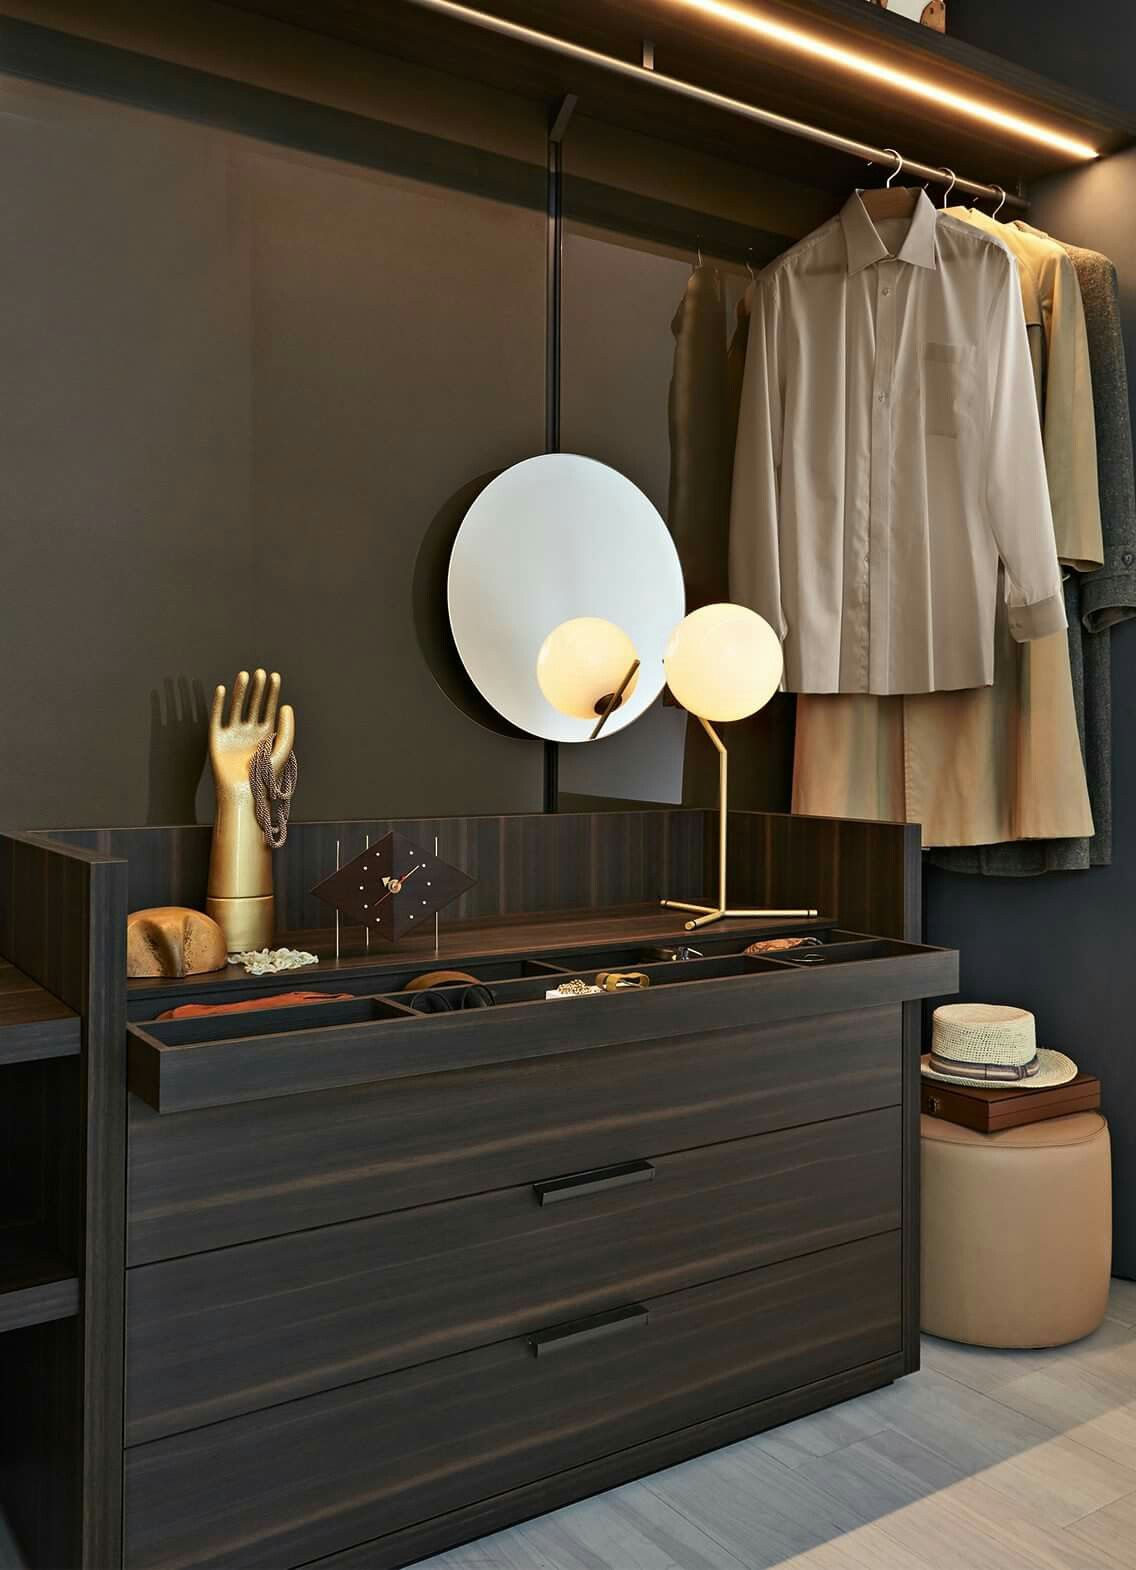 Pin by natasha van willigen on cabinets walkins and